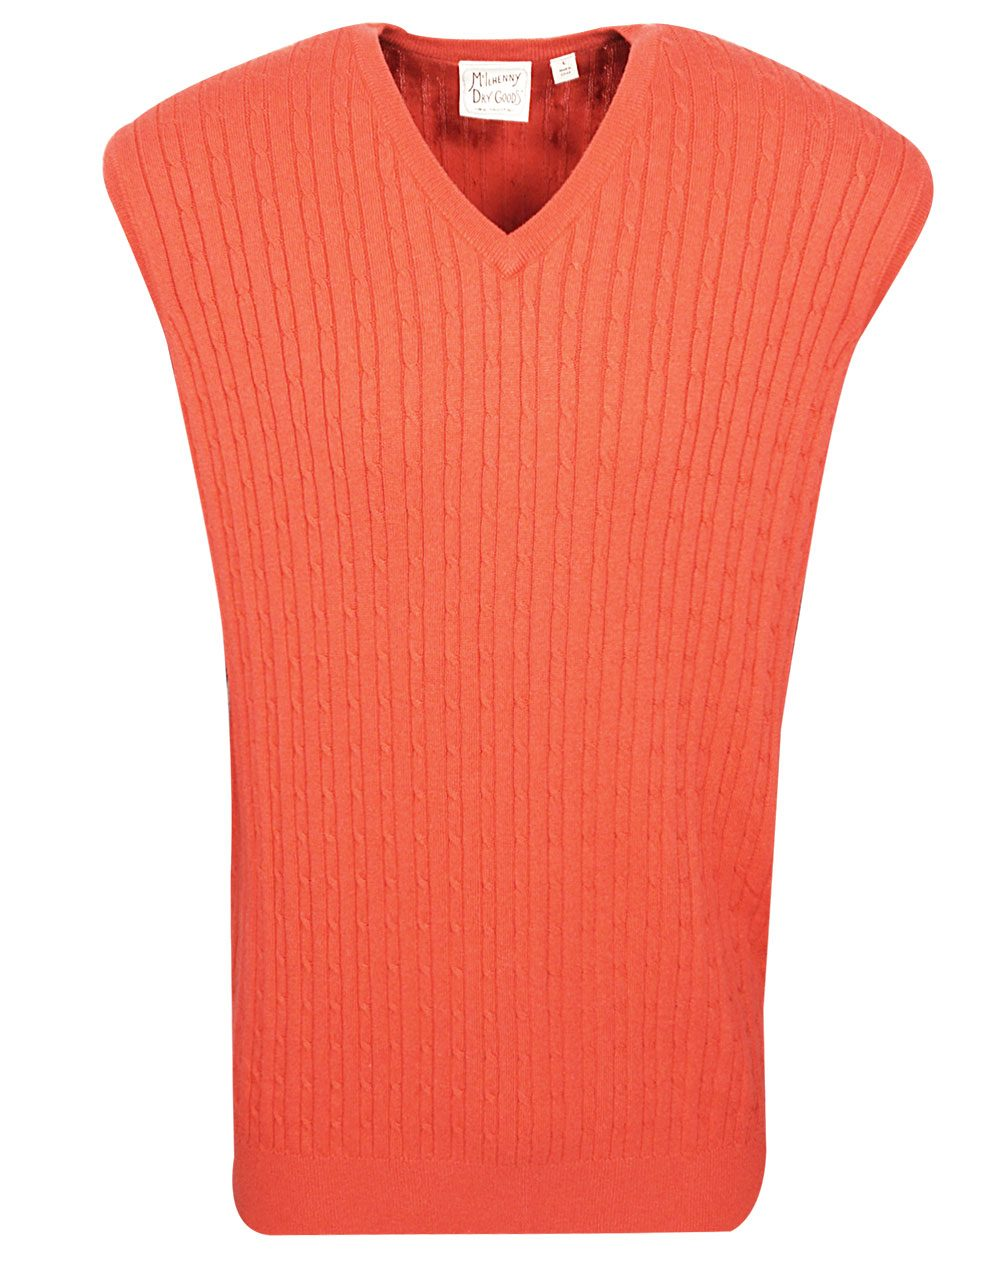 Mcilhenny Golf Cable Knit V Neck Sweater Vest image